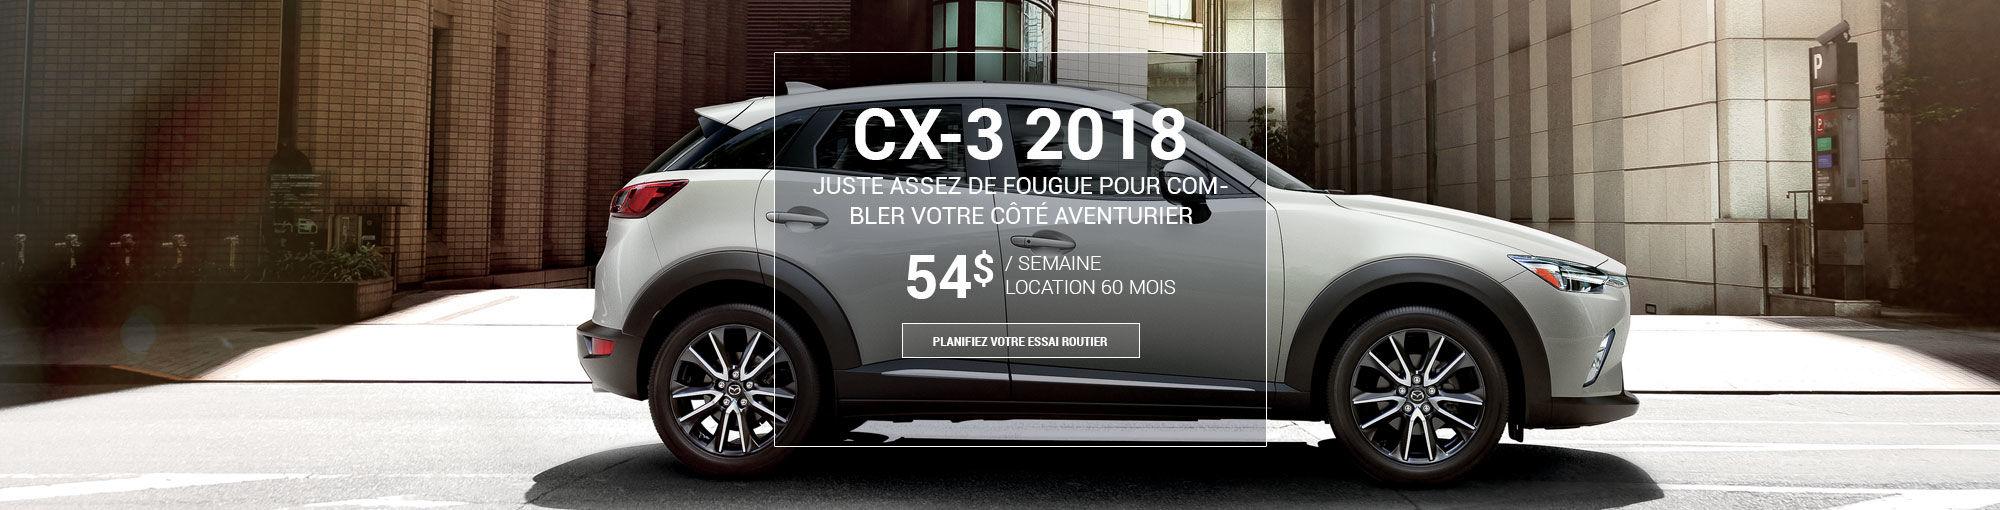 CX3 2017 - sept 2017